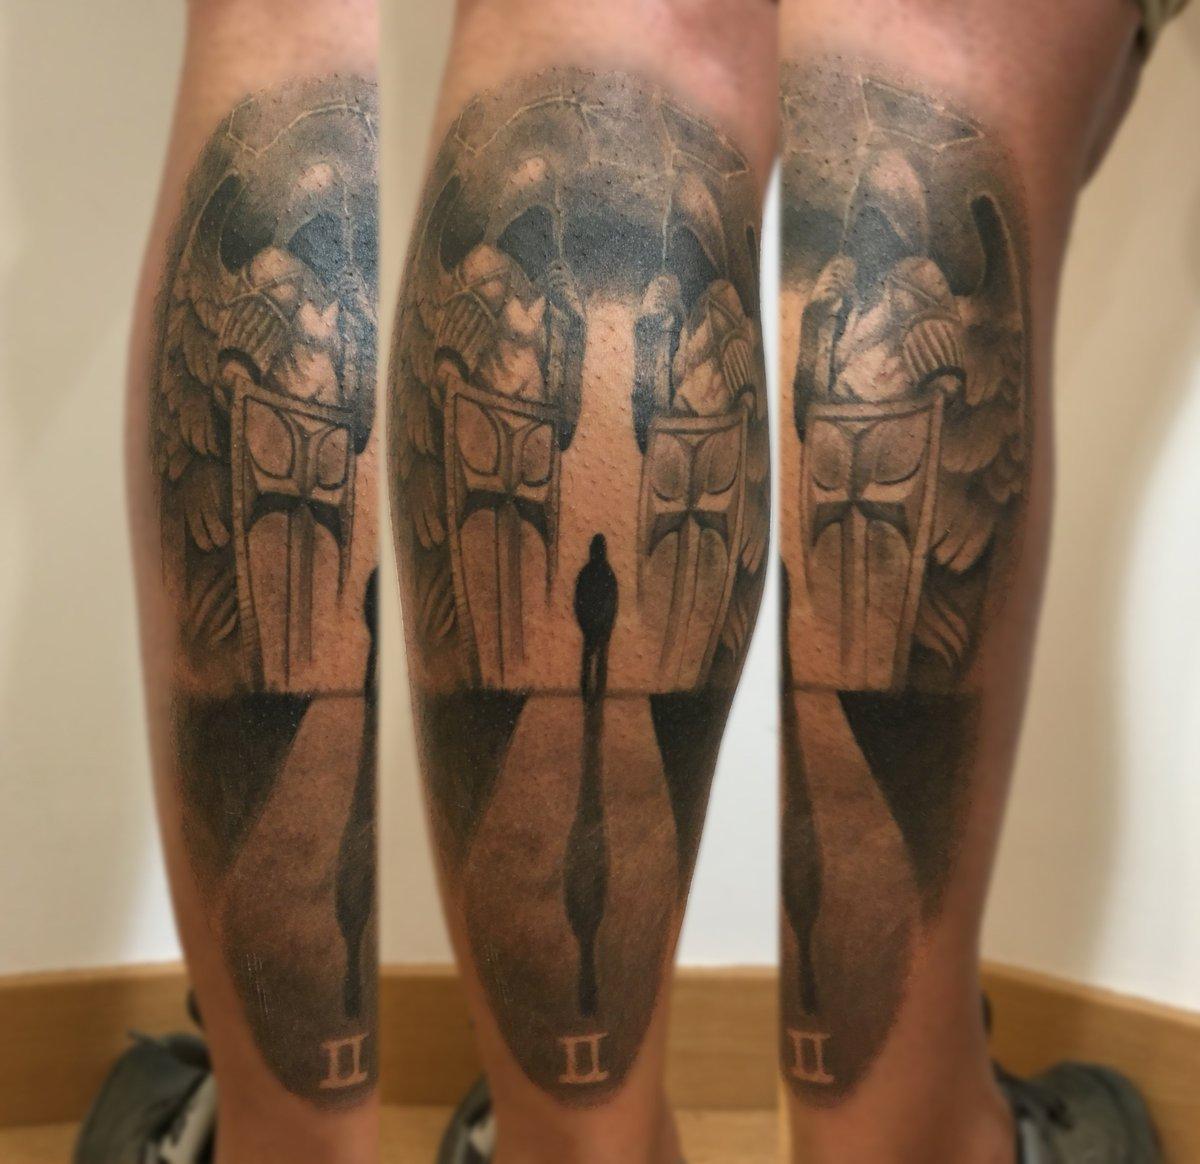 Breaking Art Tattoo on Twitter tatuaje curado ngeles custodios